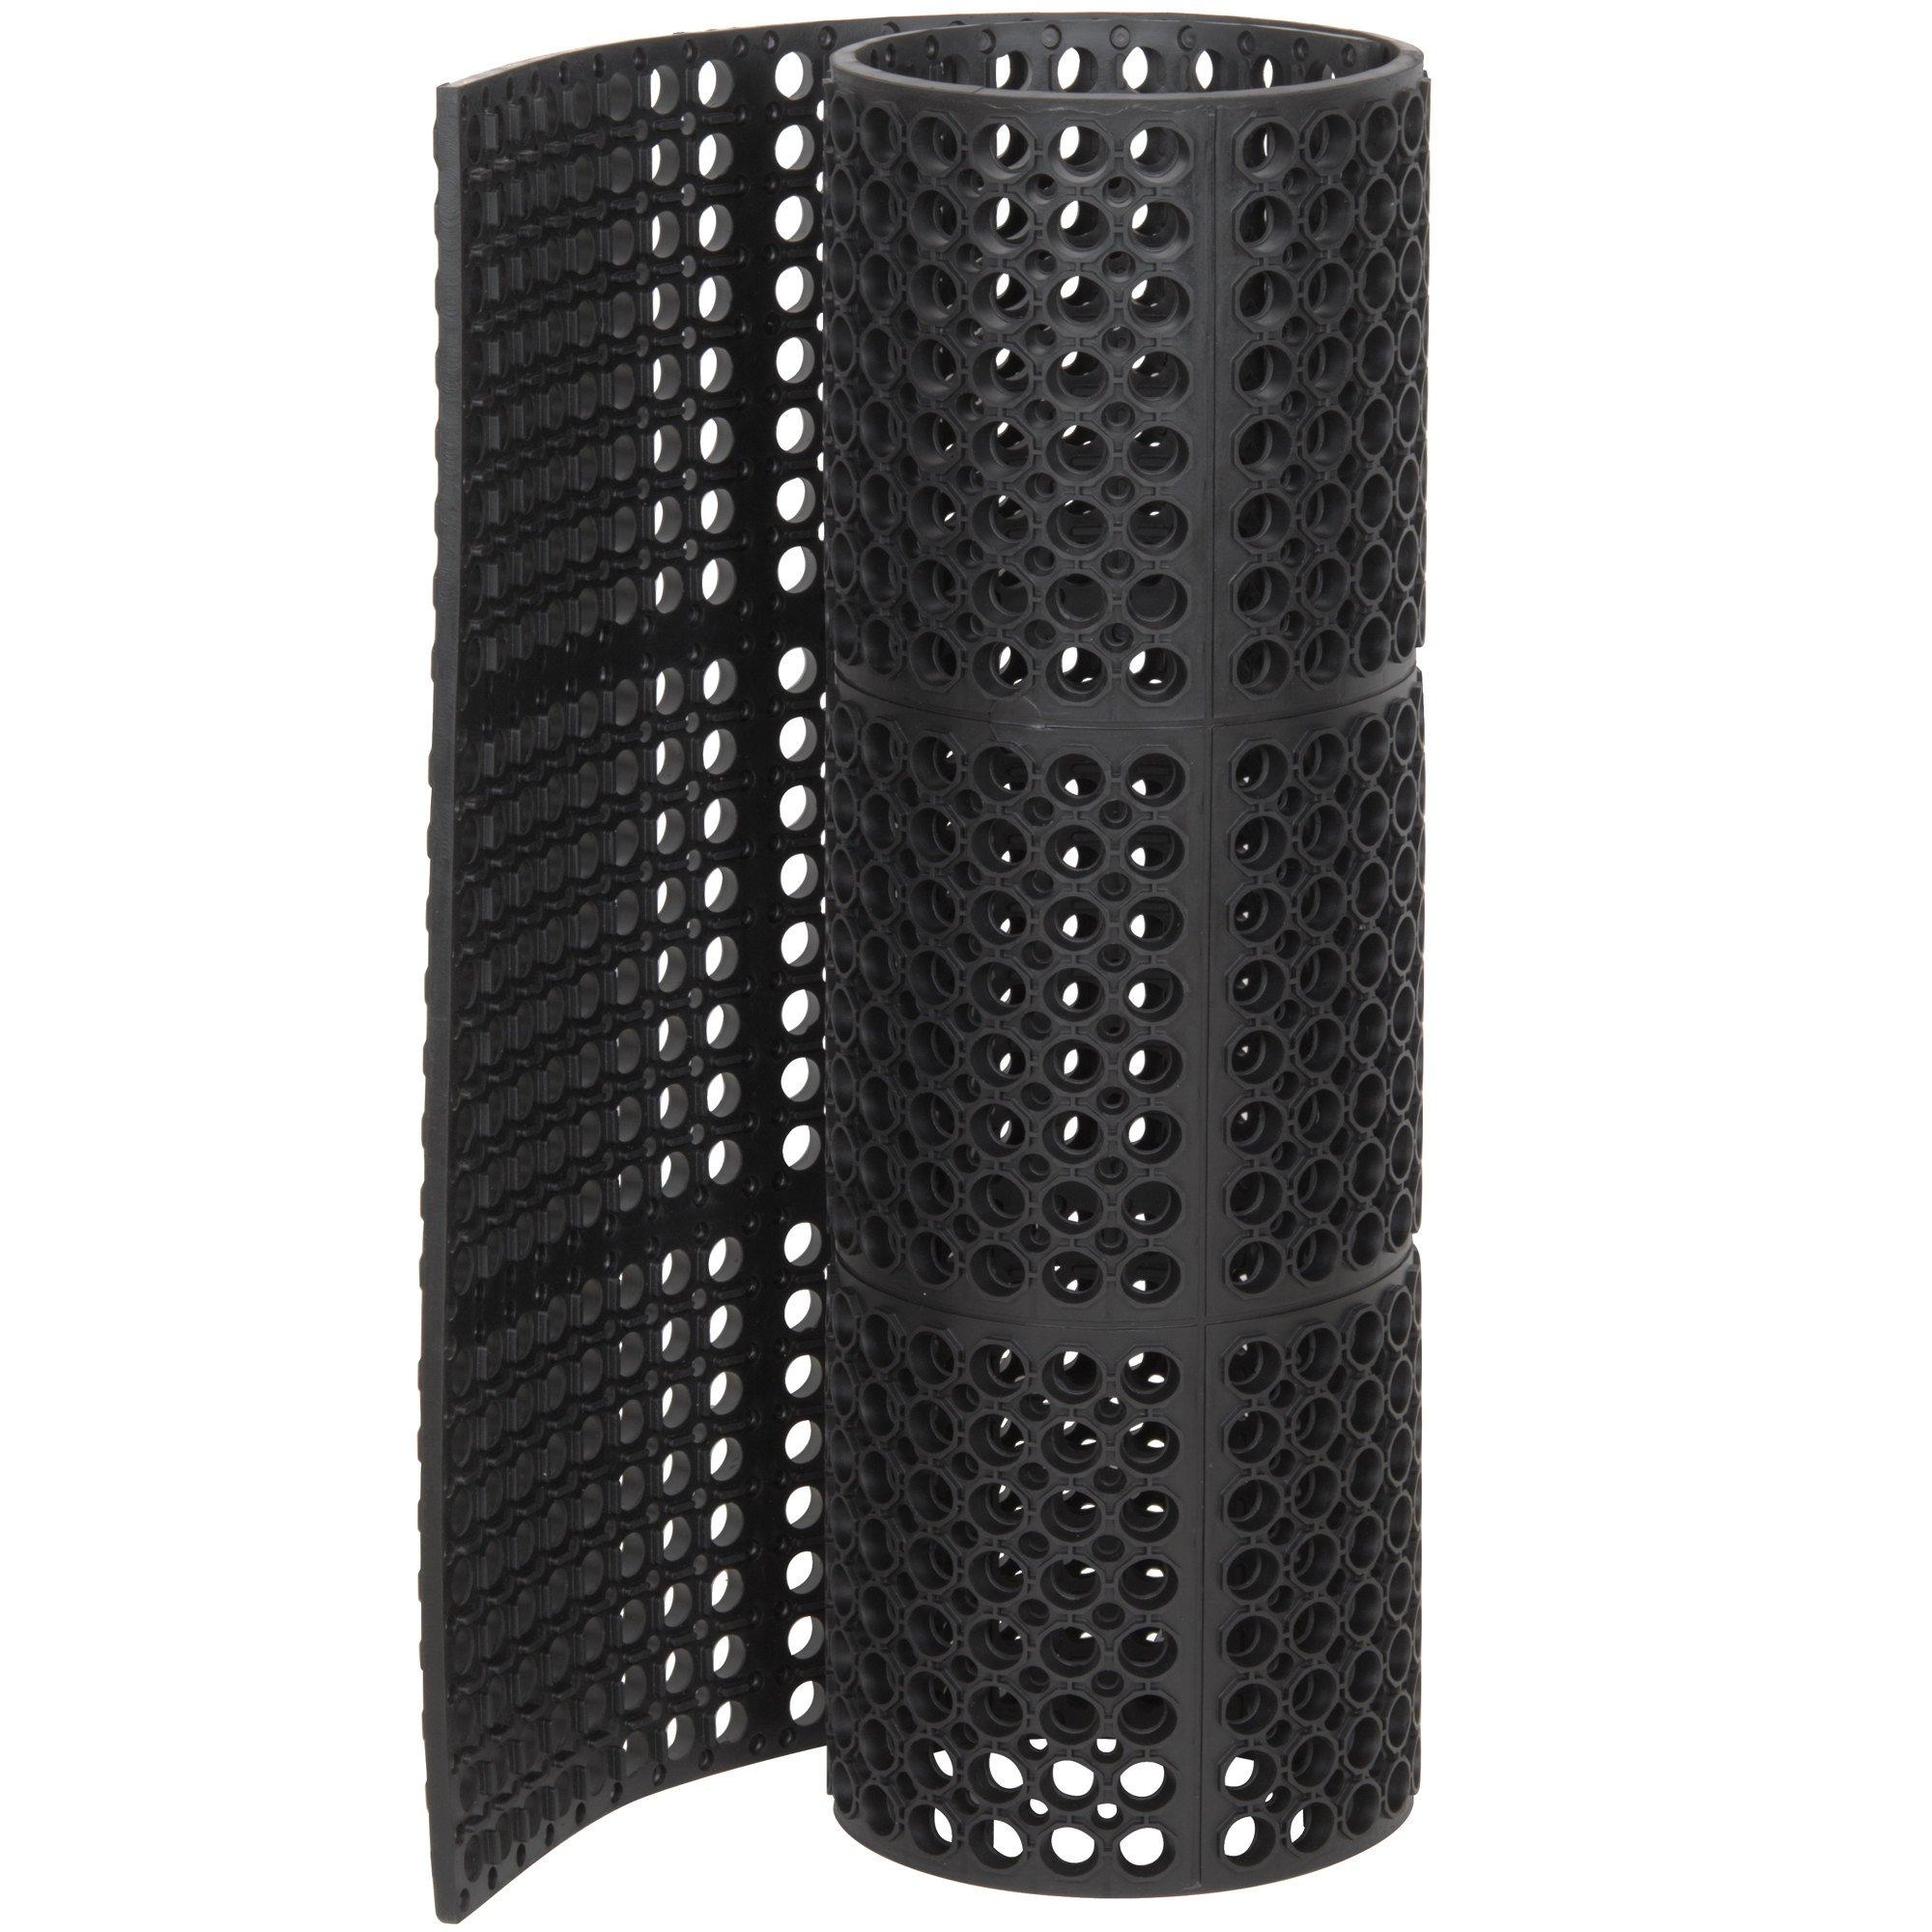 Cactus Mat 3525-C4 Rubber Vip Tuffdek Heavy Duty Anti-Fatigue and Anti-Slip, 3'X 2', Black